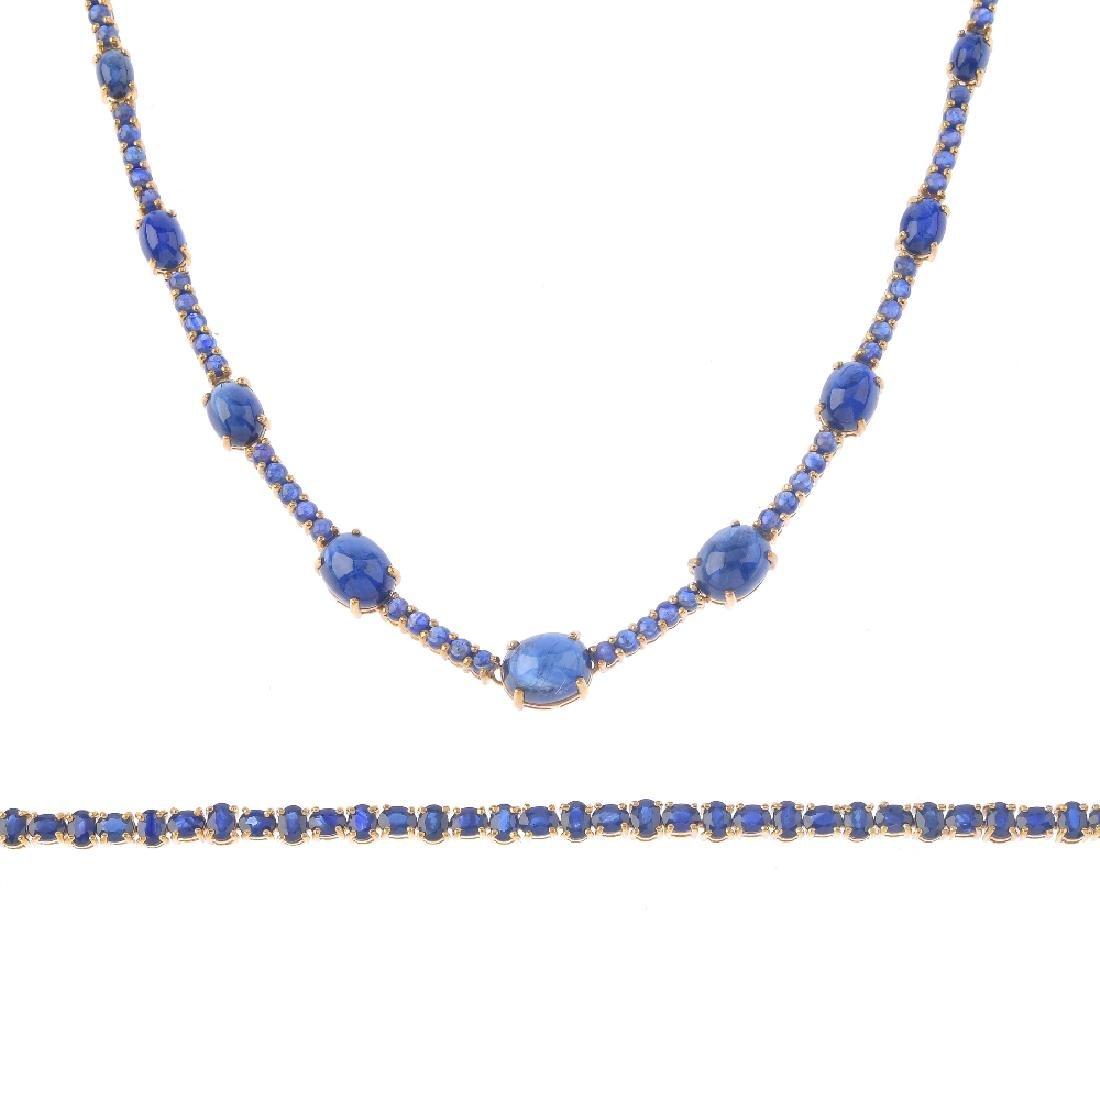 A 9ct gold sapphire necklace and bracelet. The bracelet